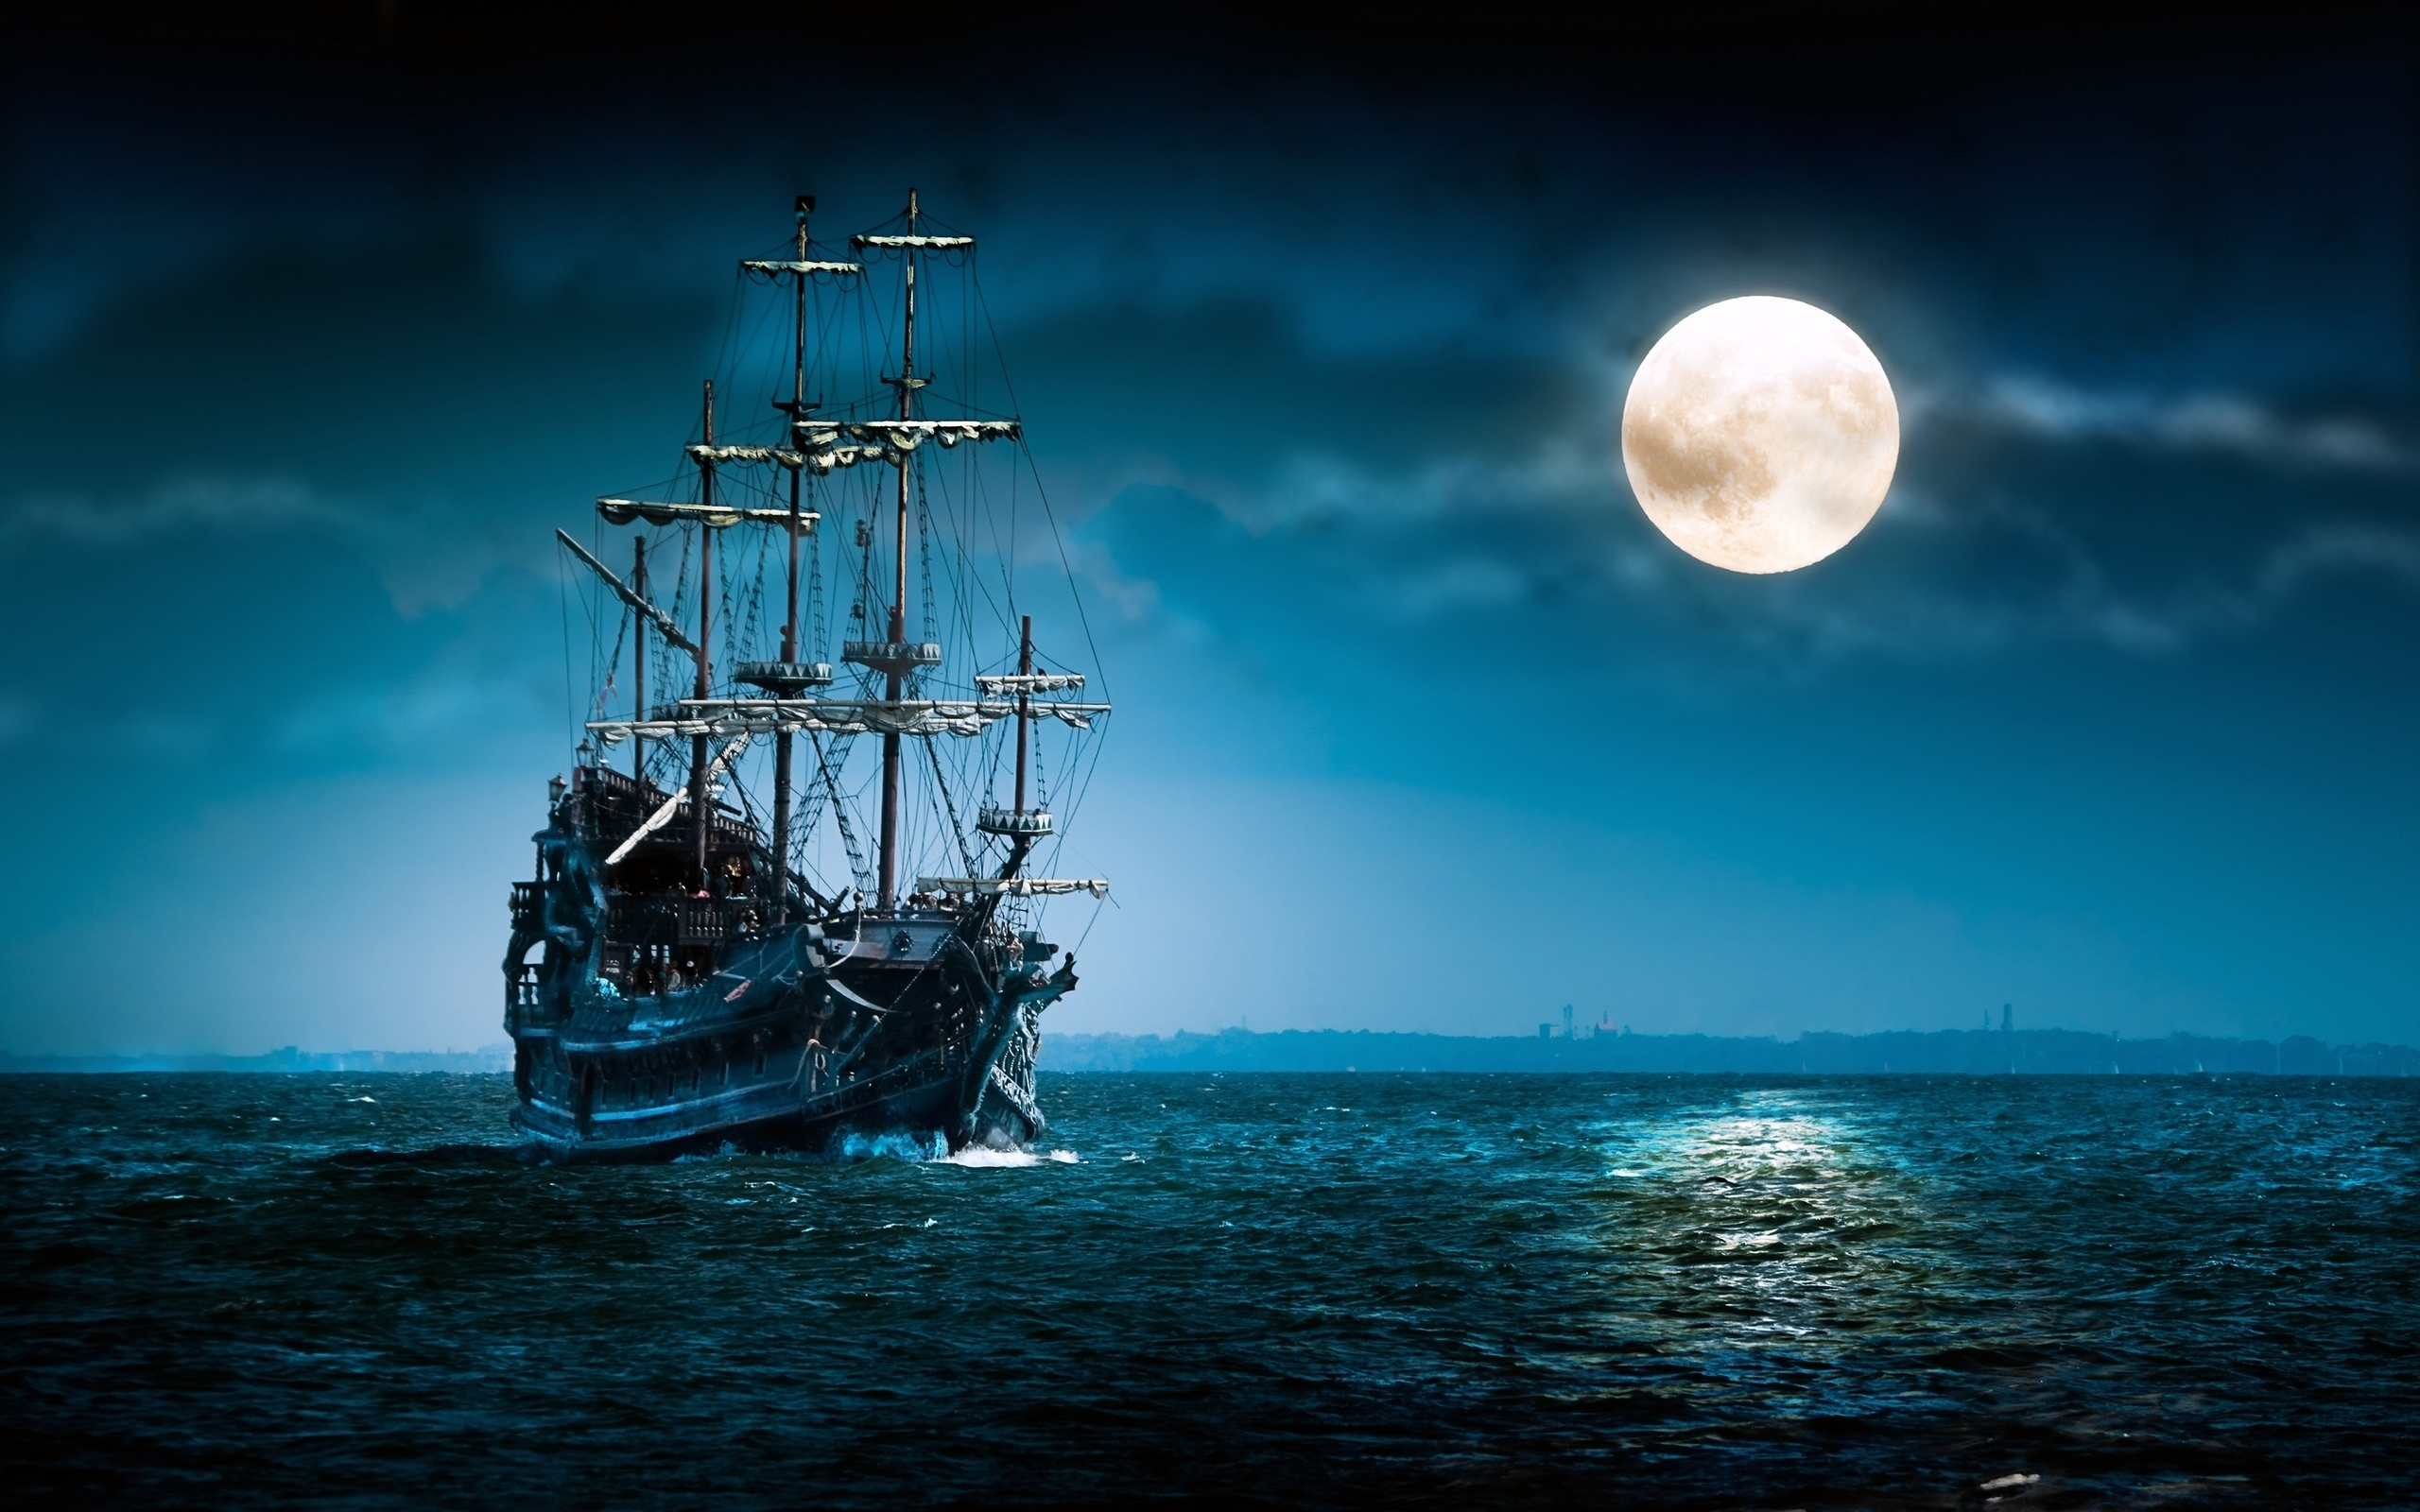 sailboat sea moon ship boat ocean night mood moon wallpaper background 2560x1600